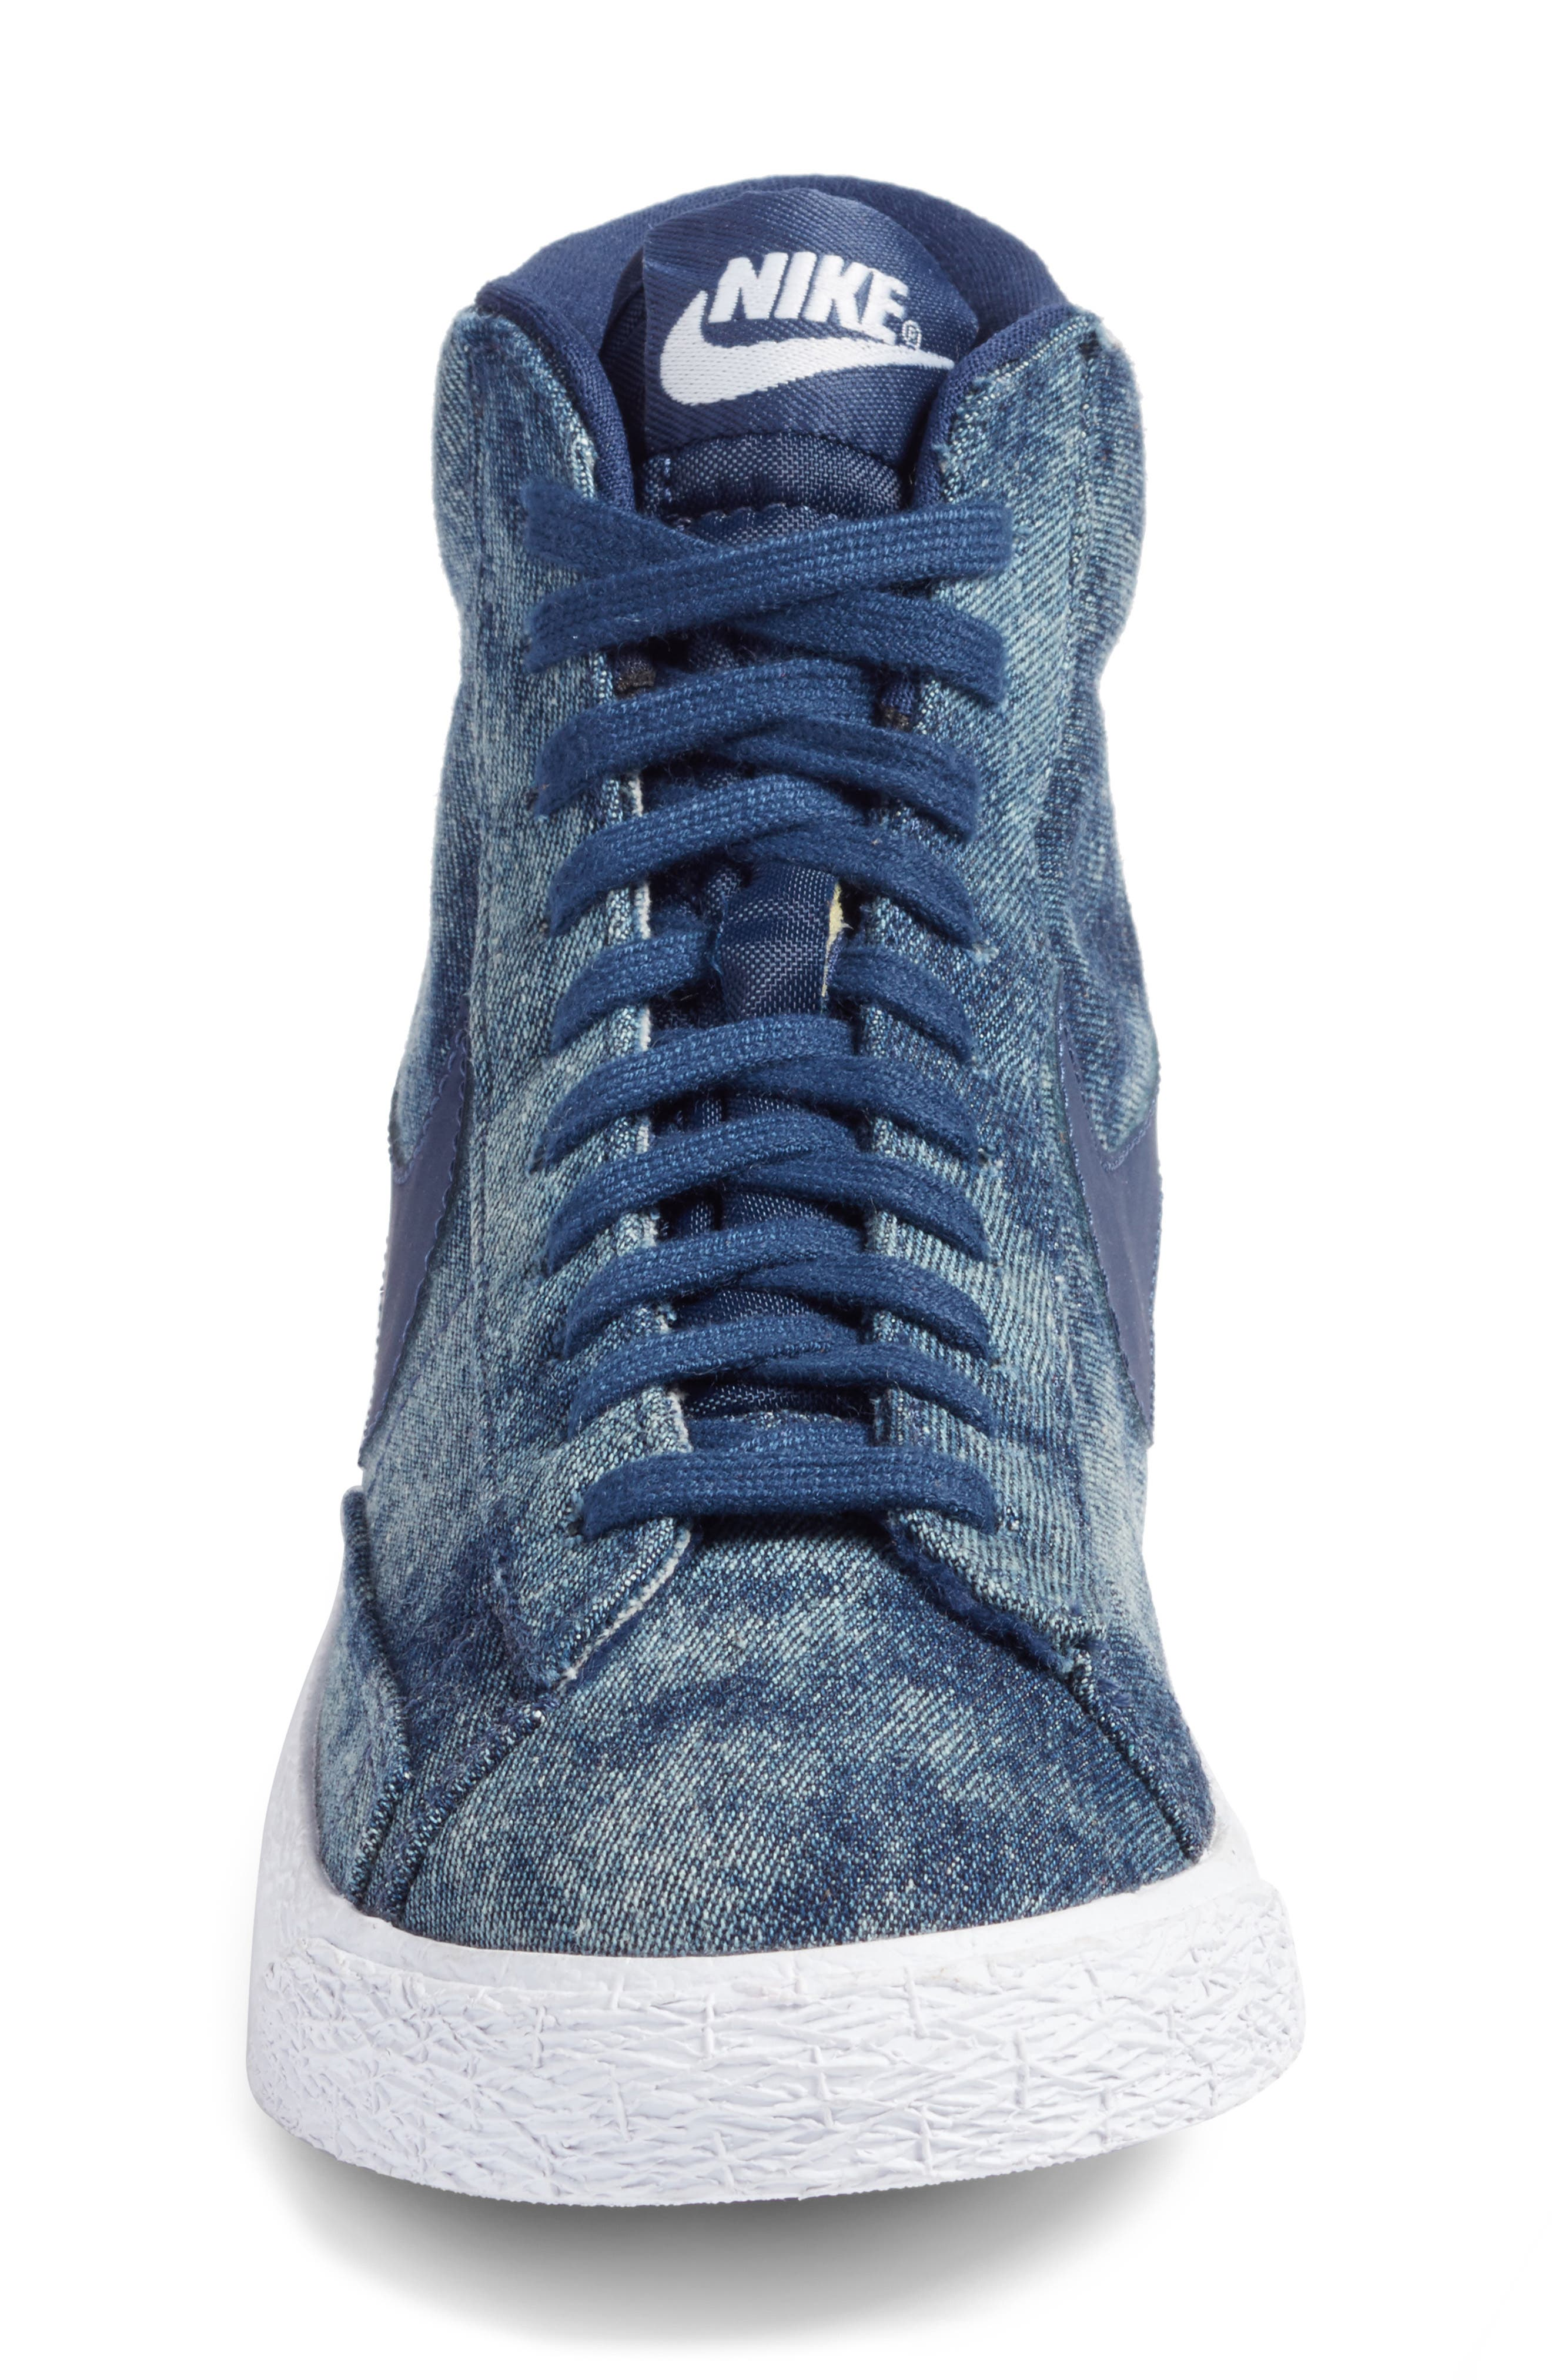 Blazer Mid SE High Top Sneaker,                             Alternate thumbnail 12, color,